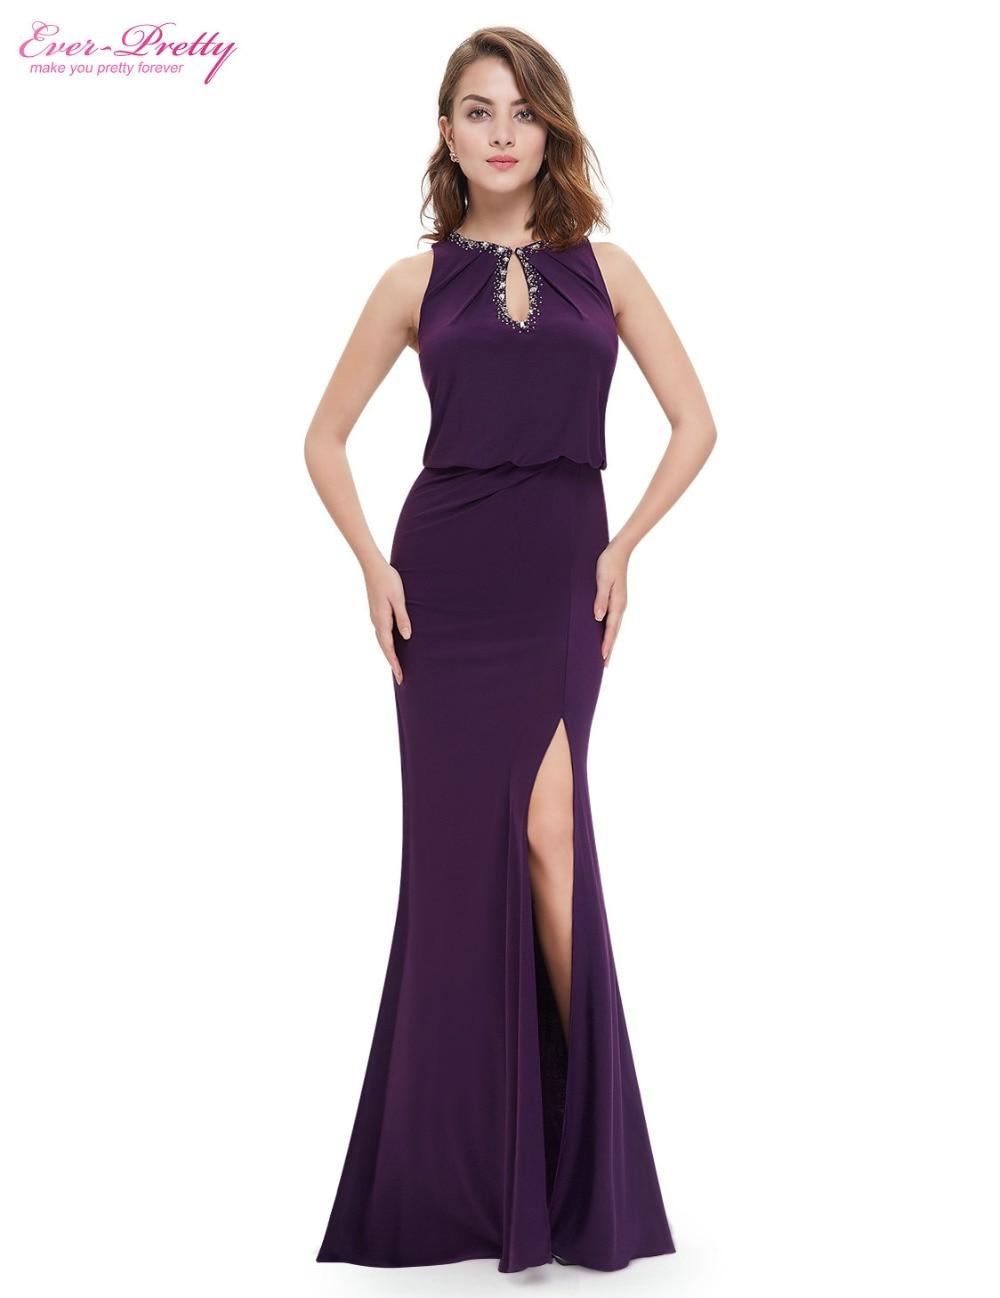 plus size elegant dresses photo - 1